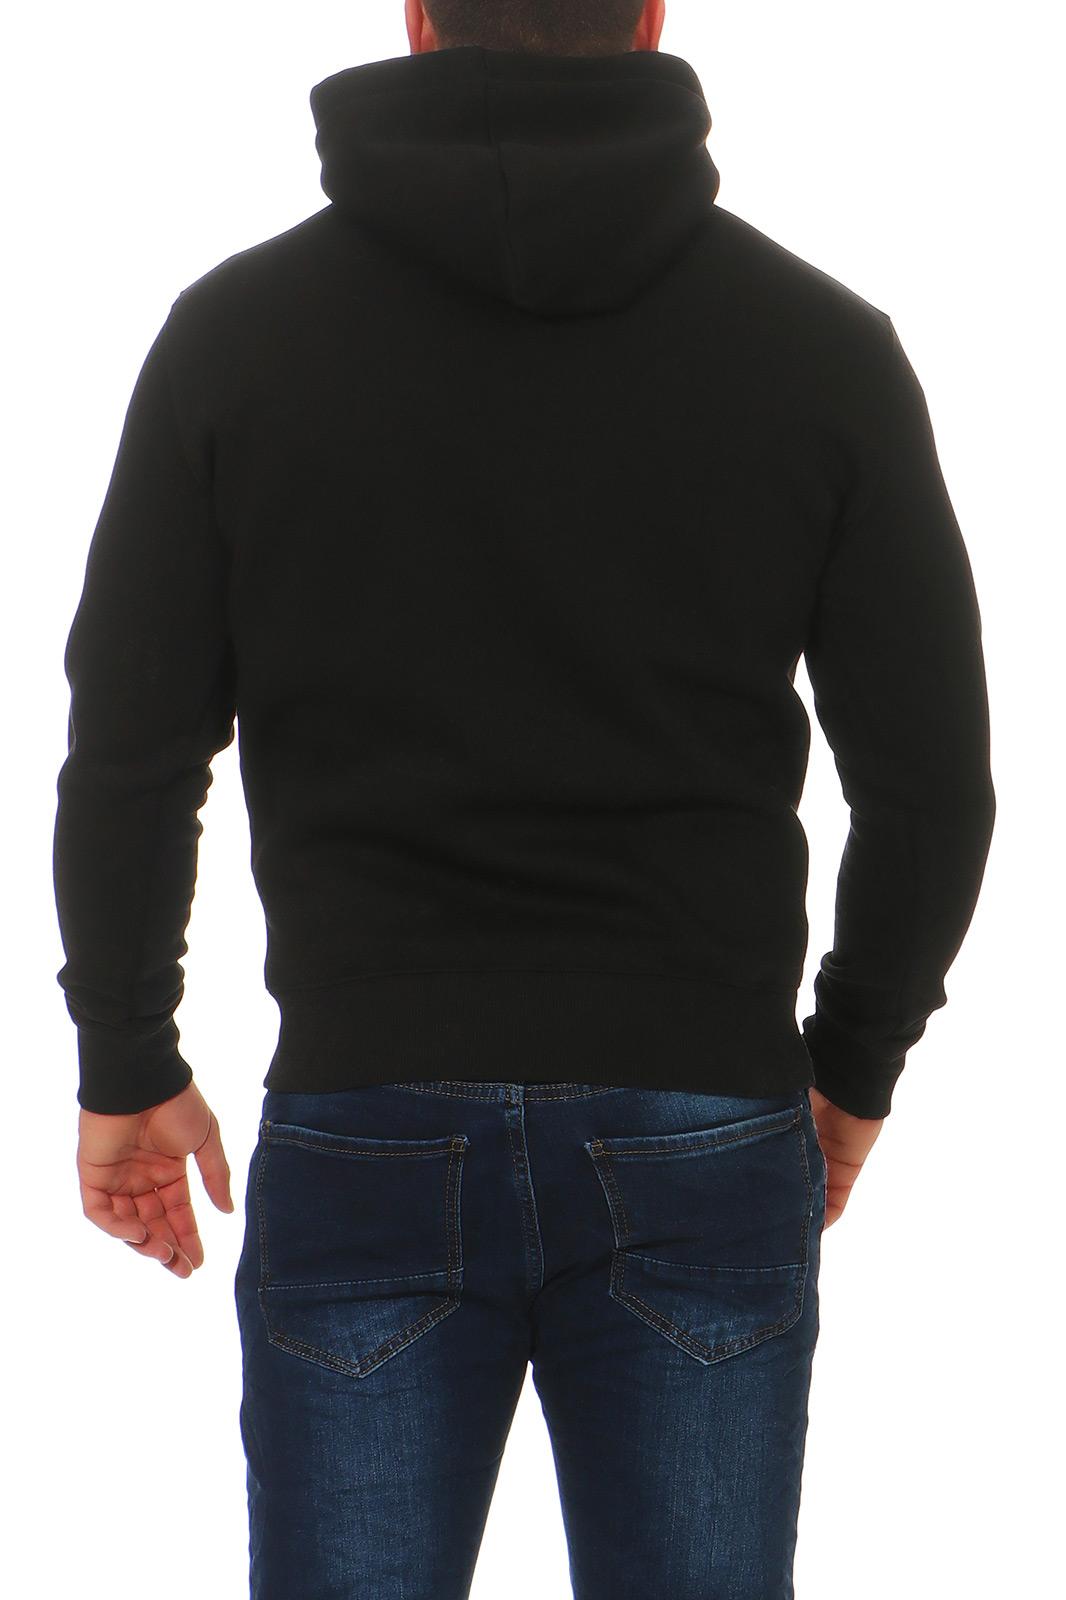 Alpha-Industries-Uomo-Hoody-Pullover-Basic-sweater-NUOVO-178312-hoodie-s-3xl miniatura 9